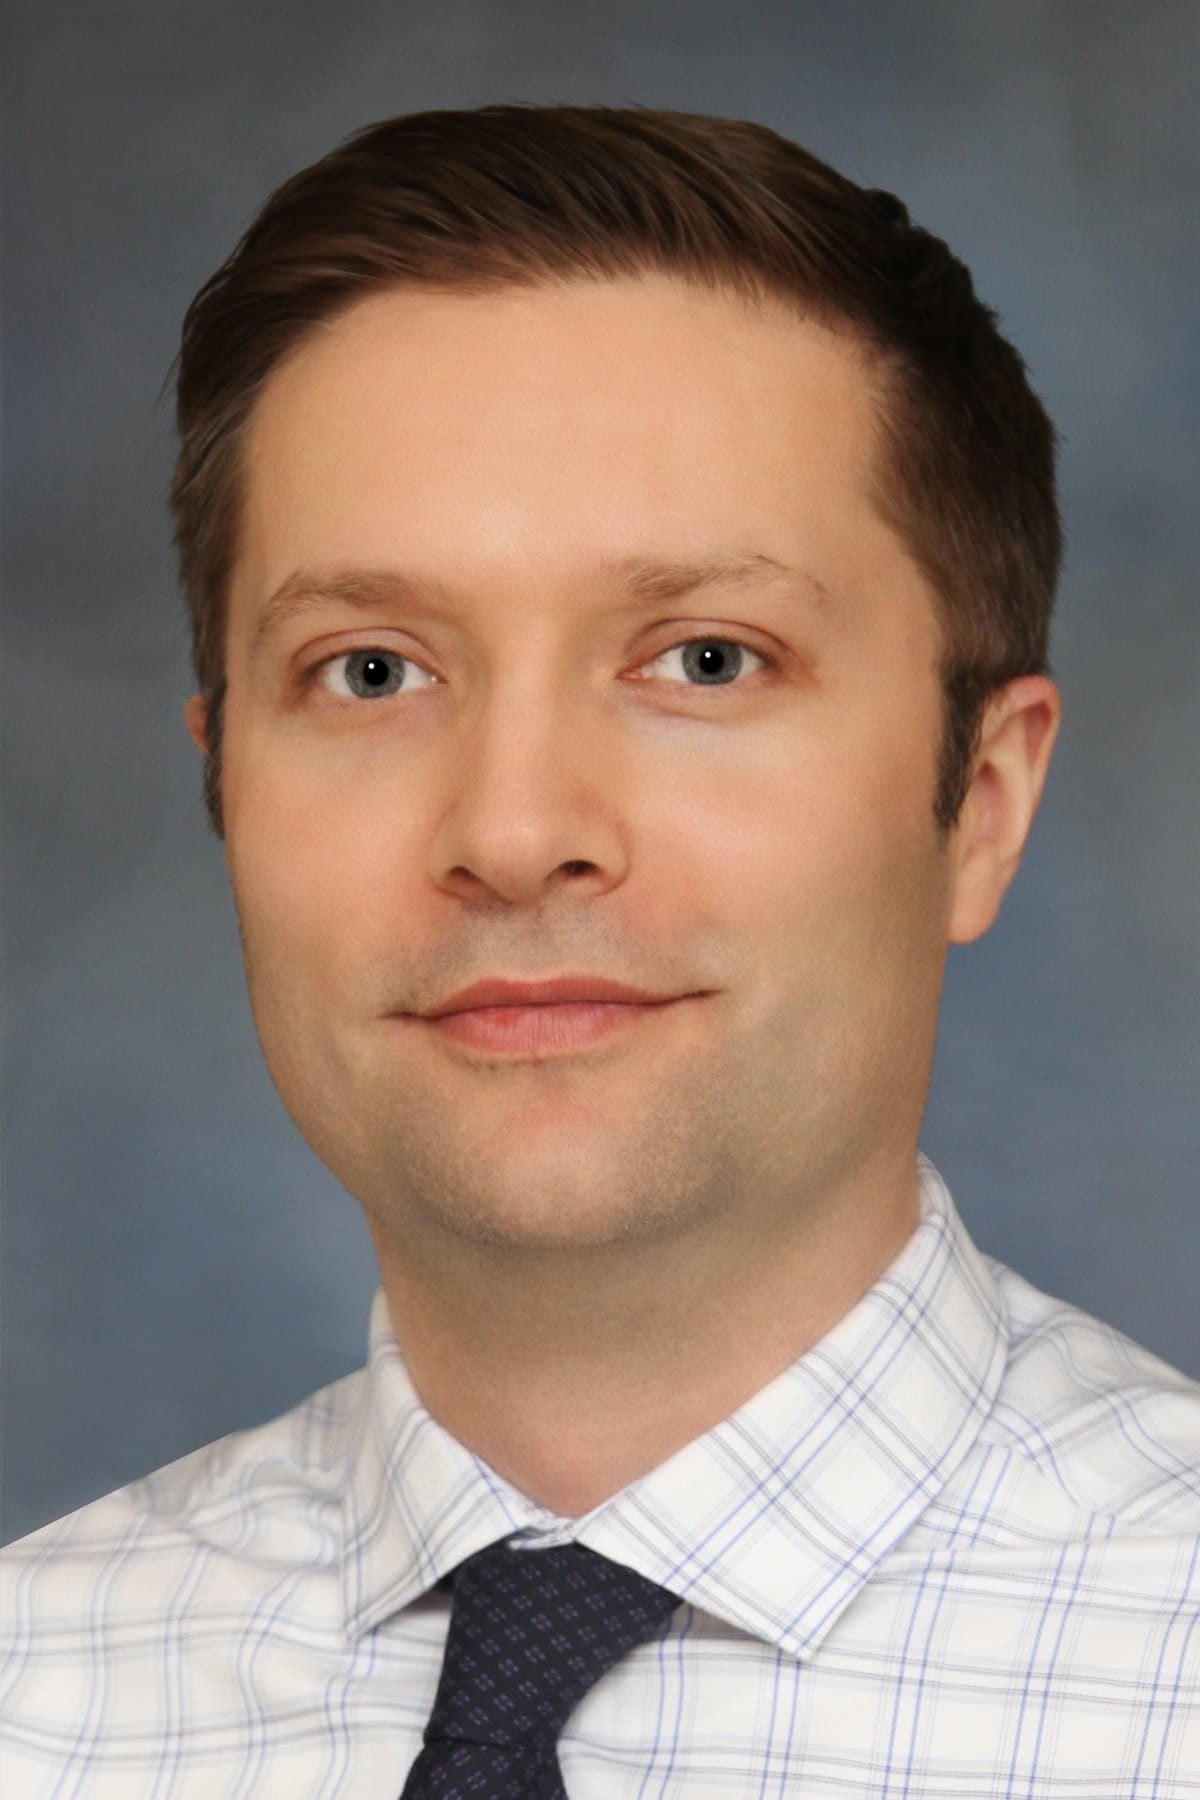 Sebastian Lesniak MD Ophthalmologist Cornea Specialist & Cataract Surgeon